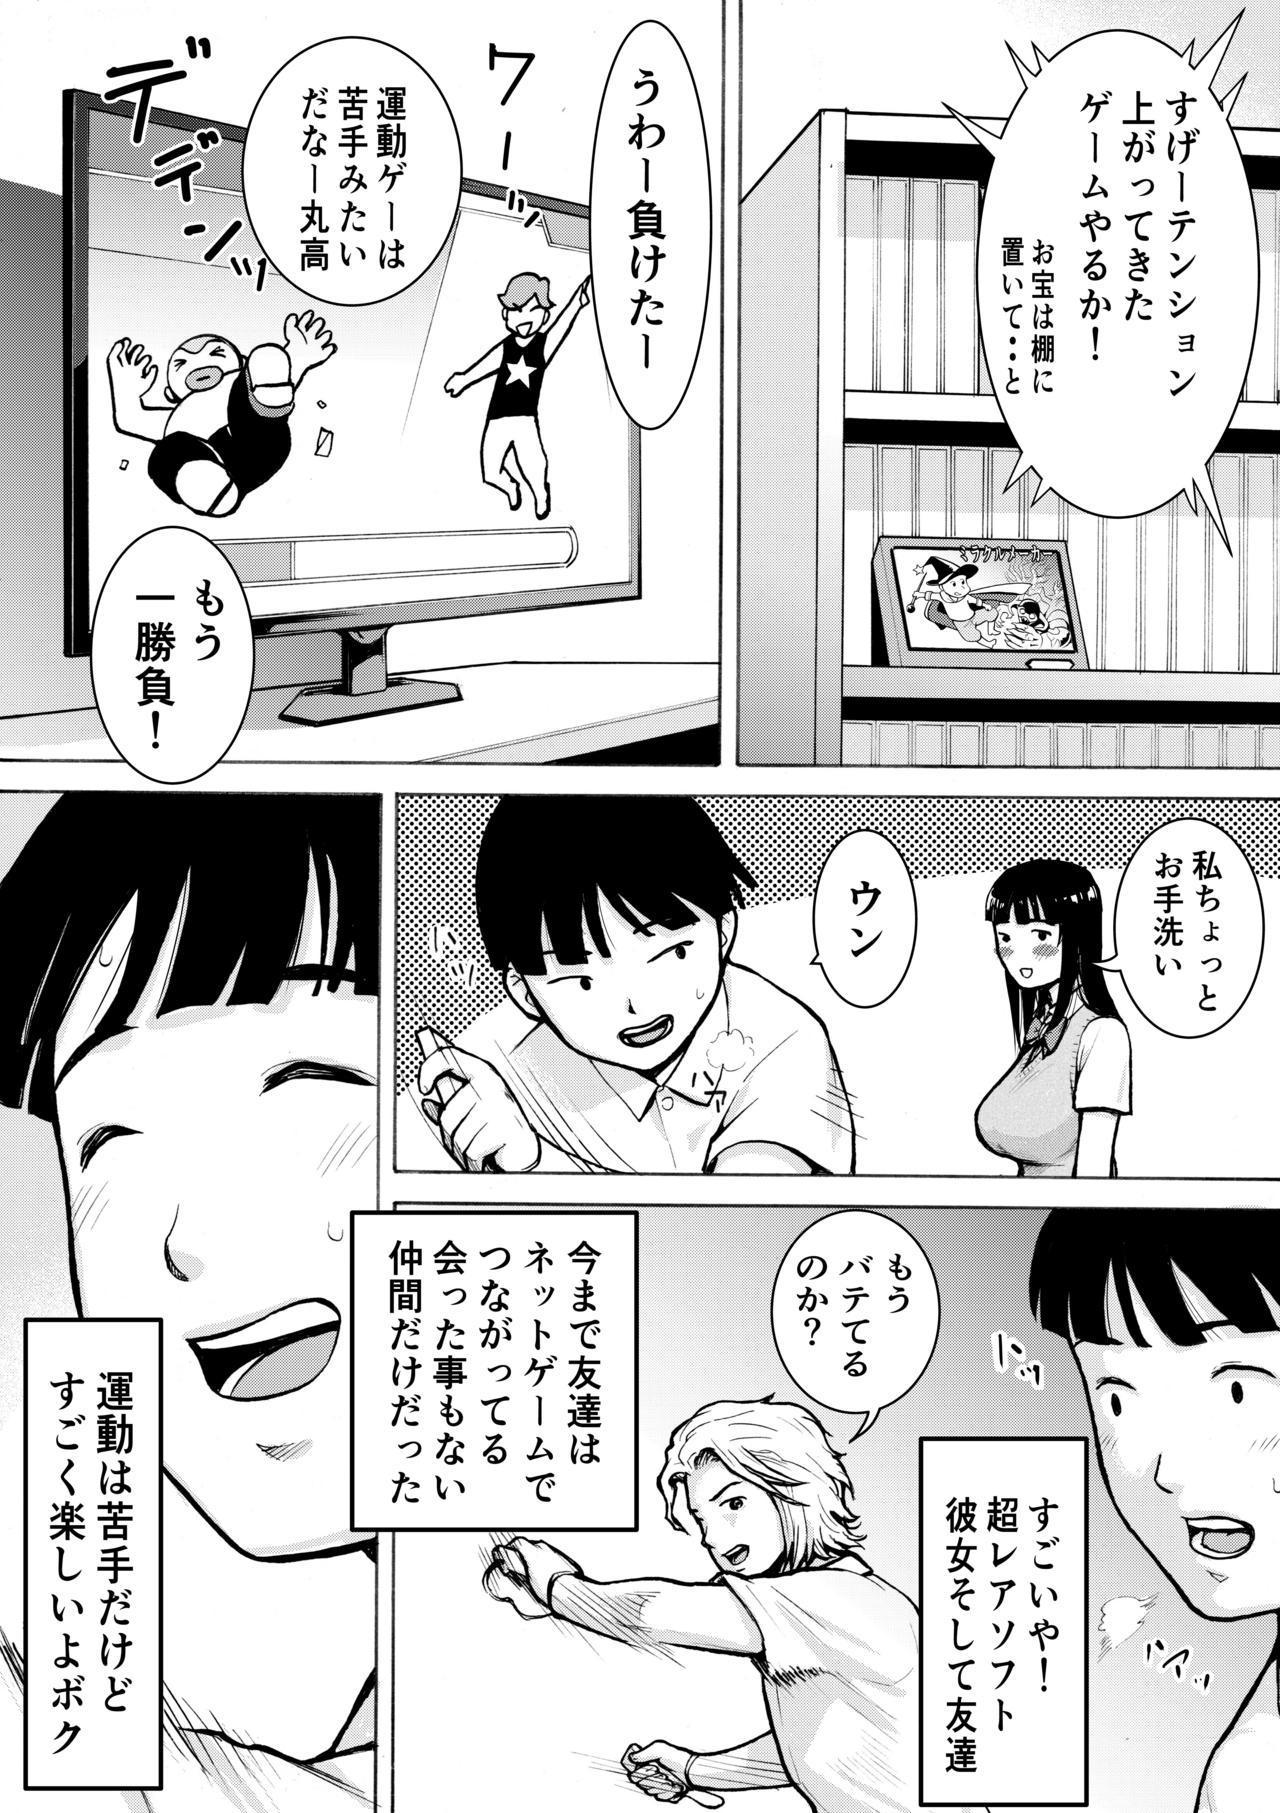 Retro Girl 13